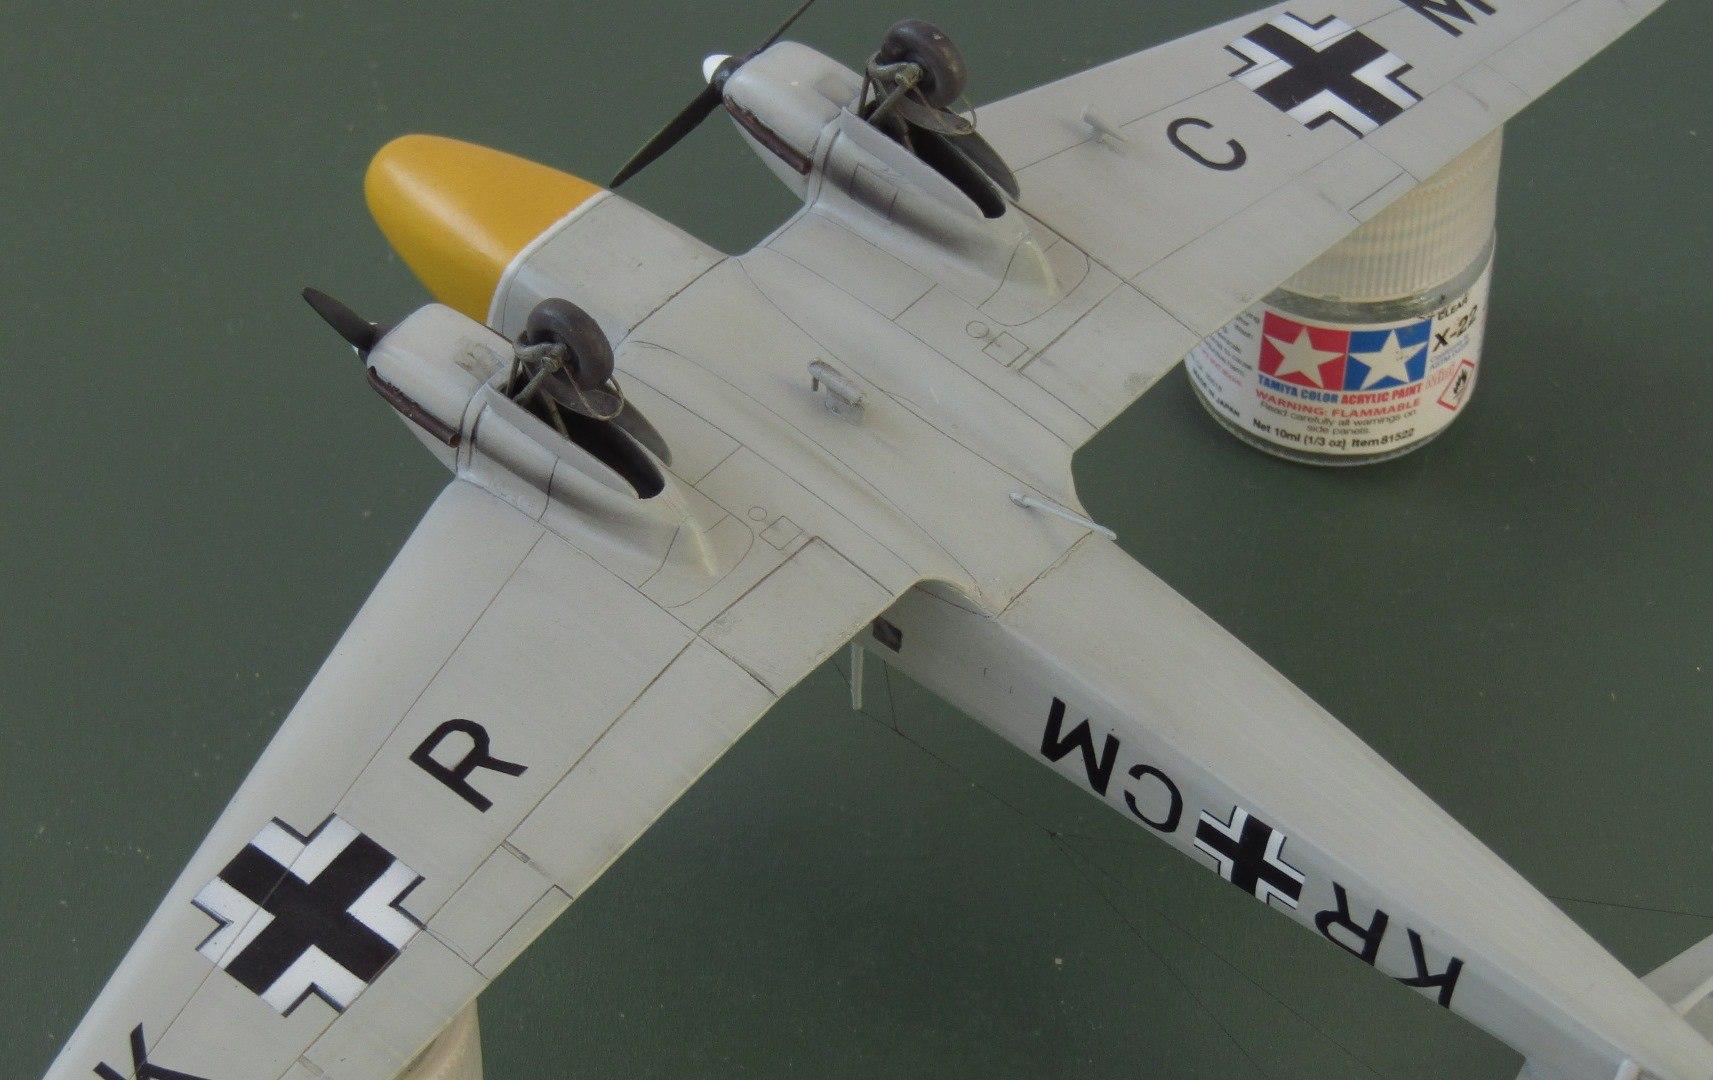 FW - 58C weihe 1/72 (Special Hobby) TYOKpyvTT0k